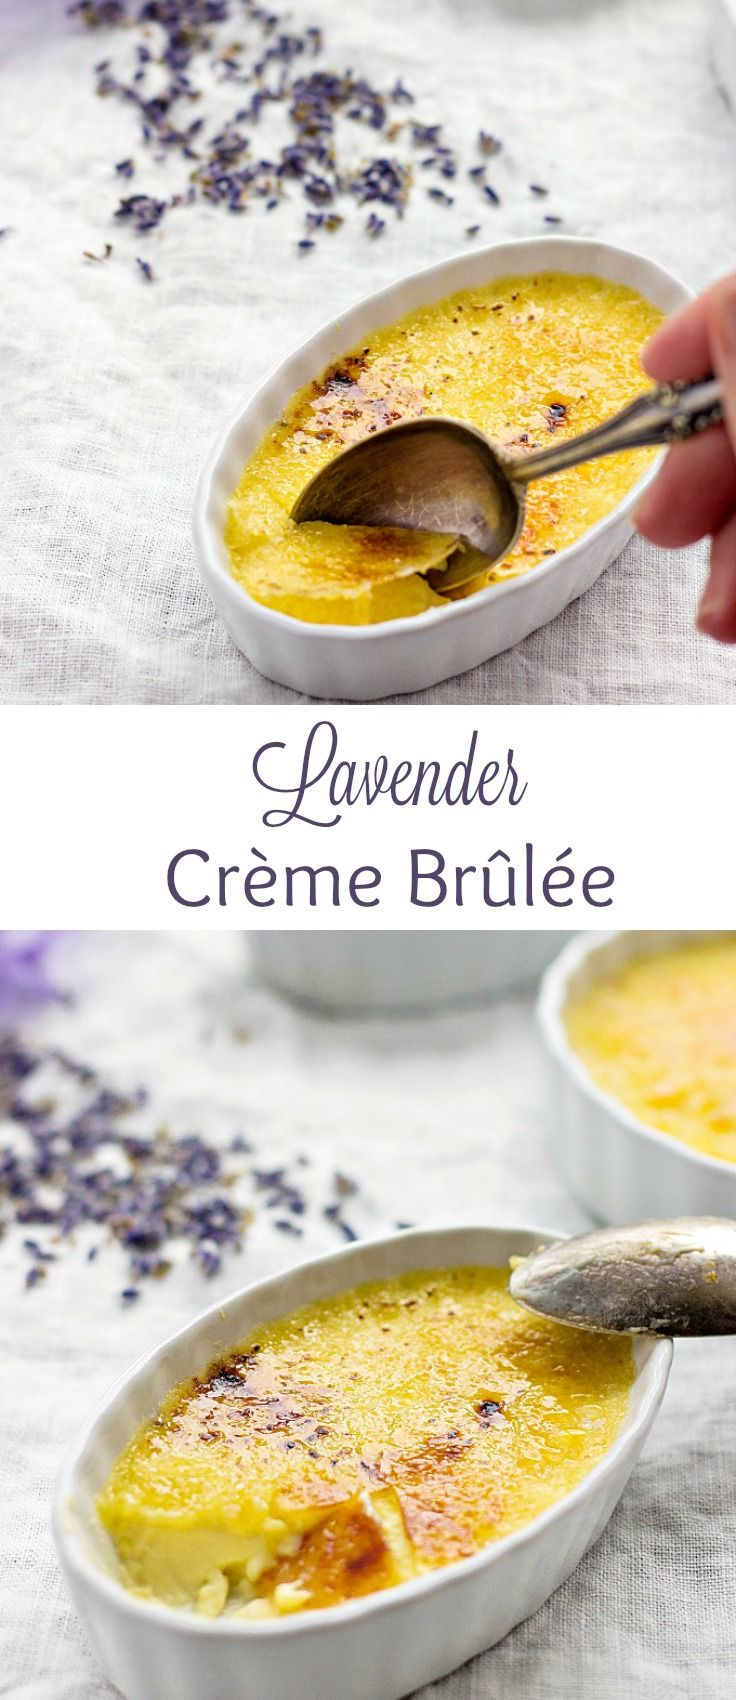 287 best Crème brûlée images on Pinterest | Desert recipes, Dessert ...